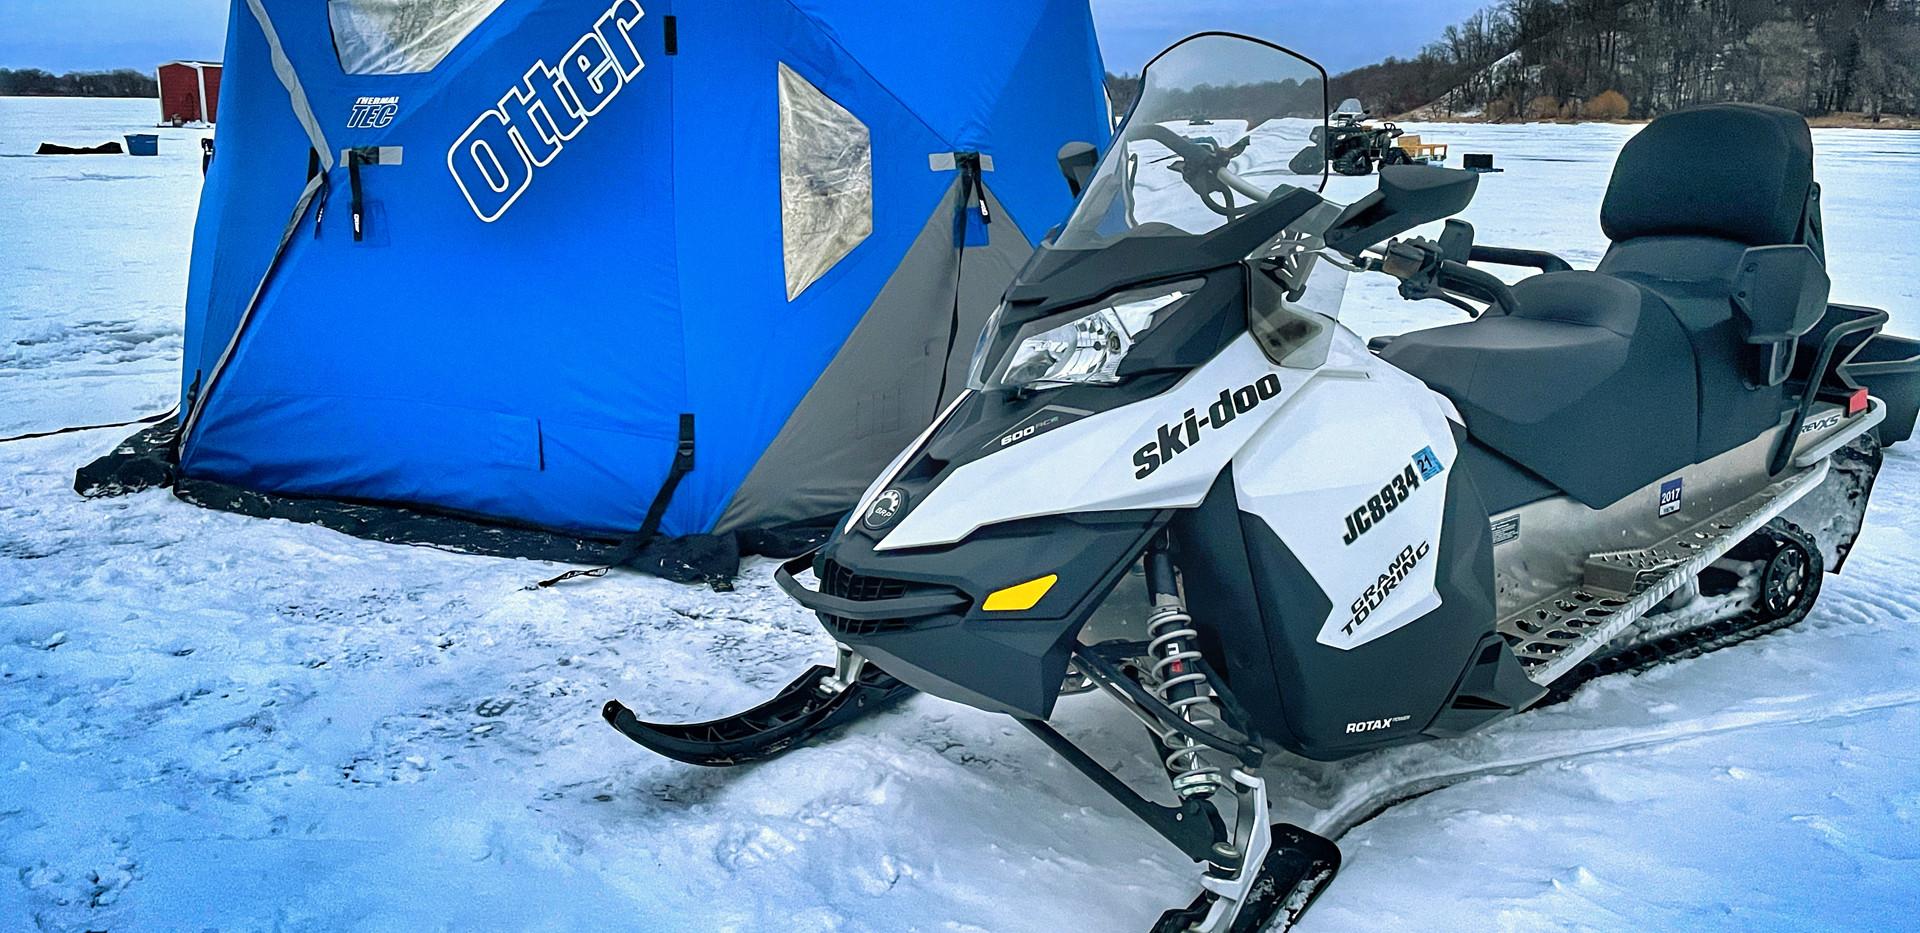 Otter Resort Hub and Ski Doo snowmobile.